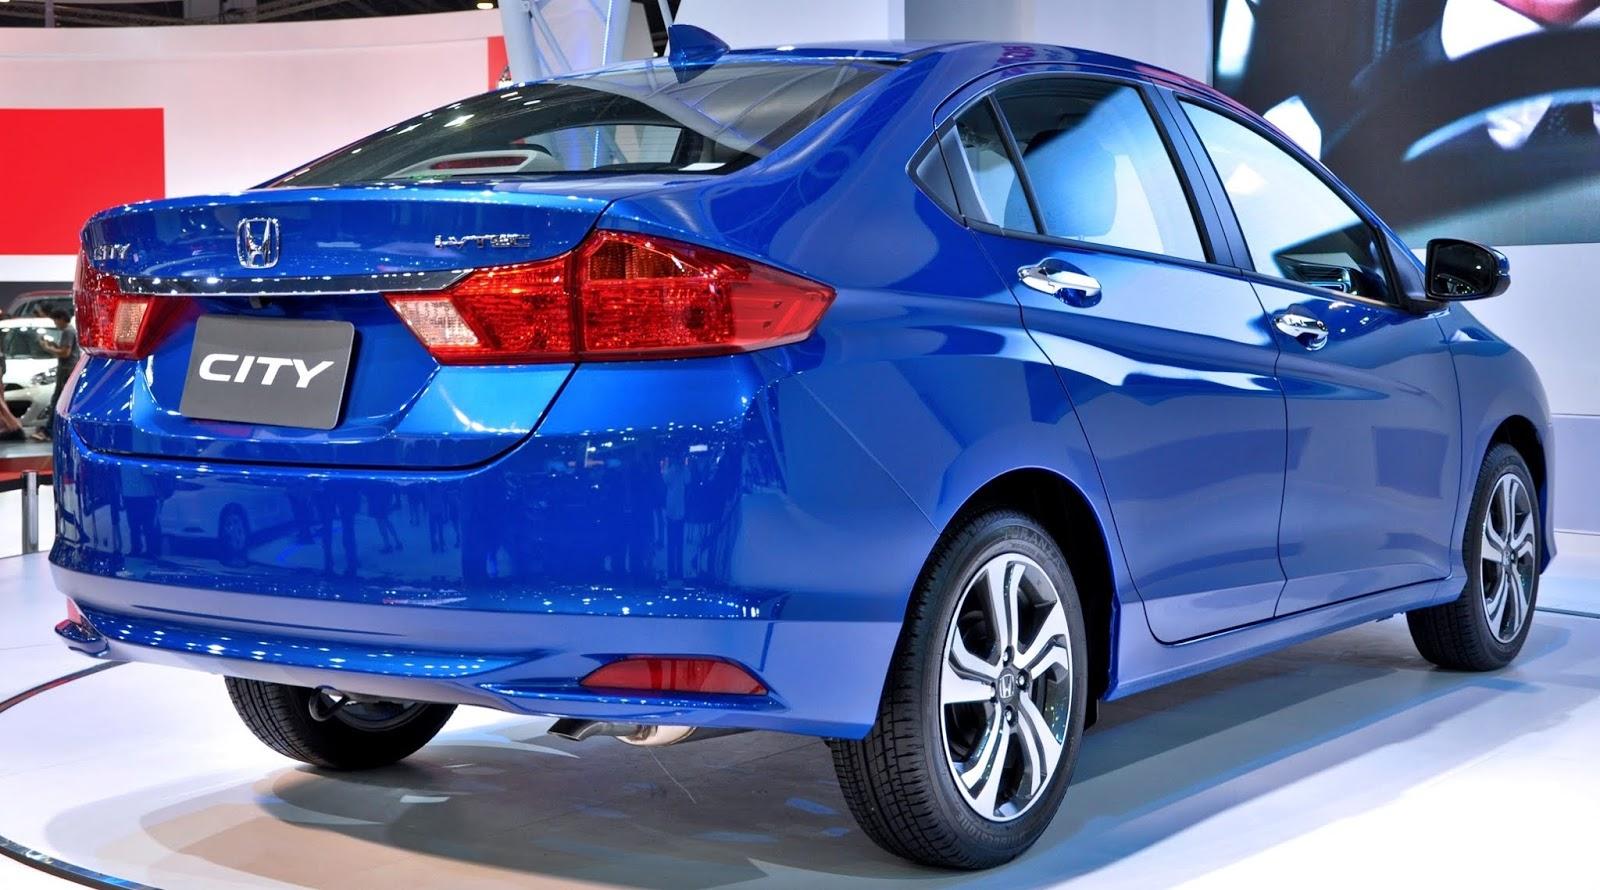 Honda City New Model 2019 In Pakistan Insight Trending